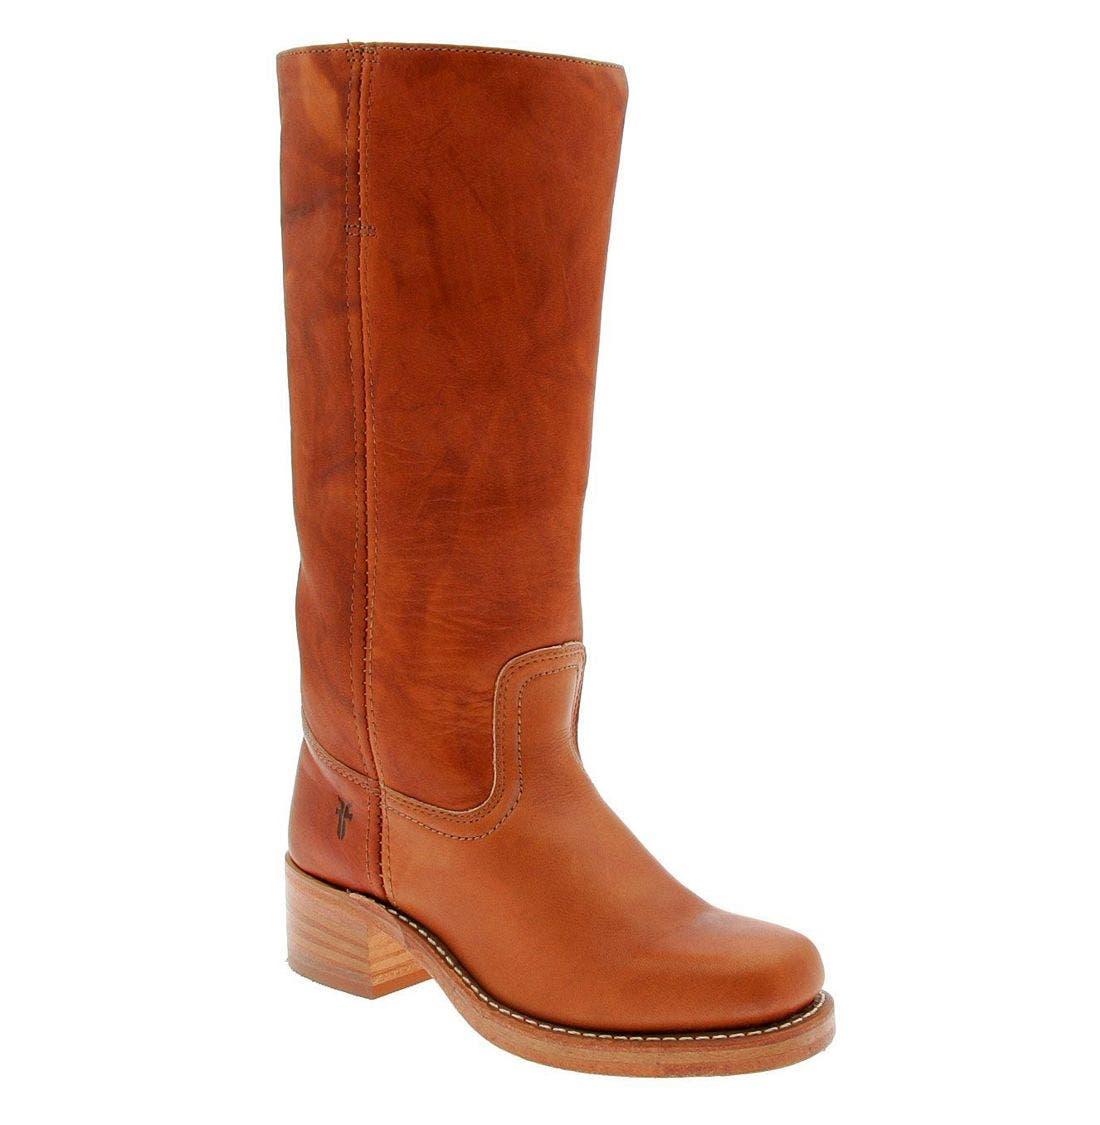 Main Image - Frye 'Campus 14L' Boot (Women)